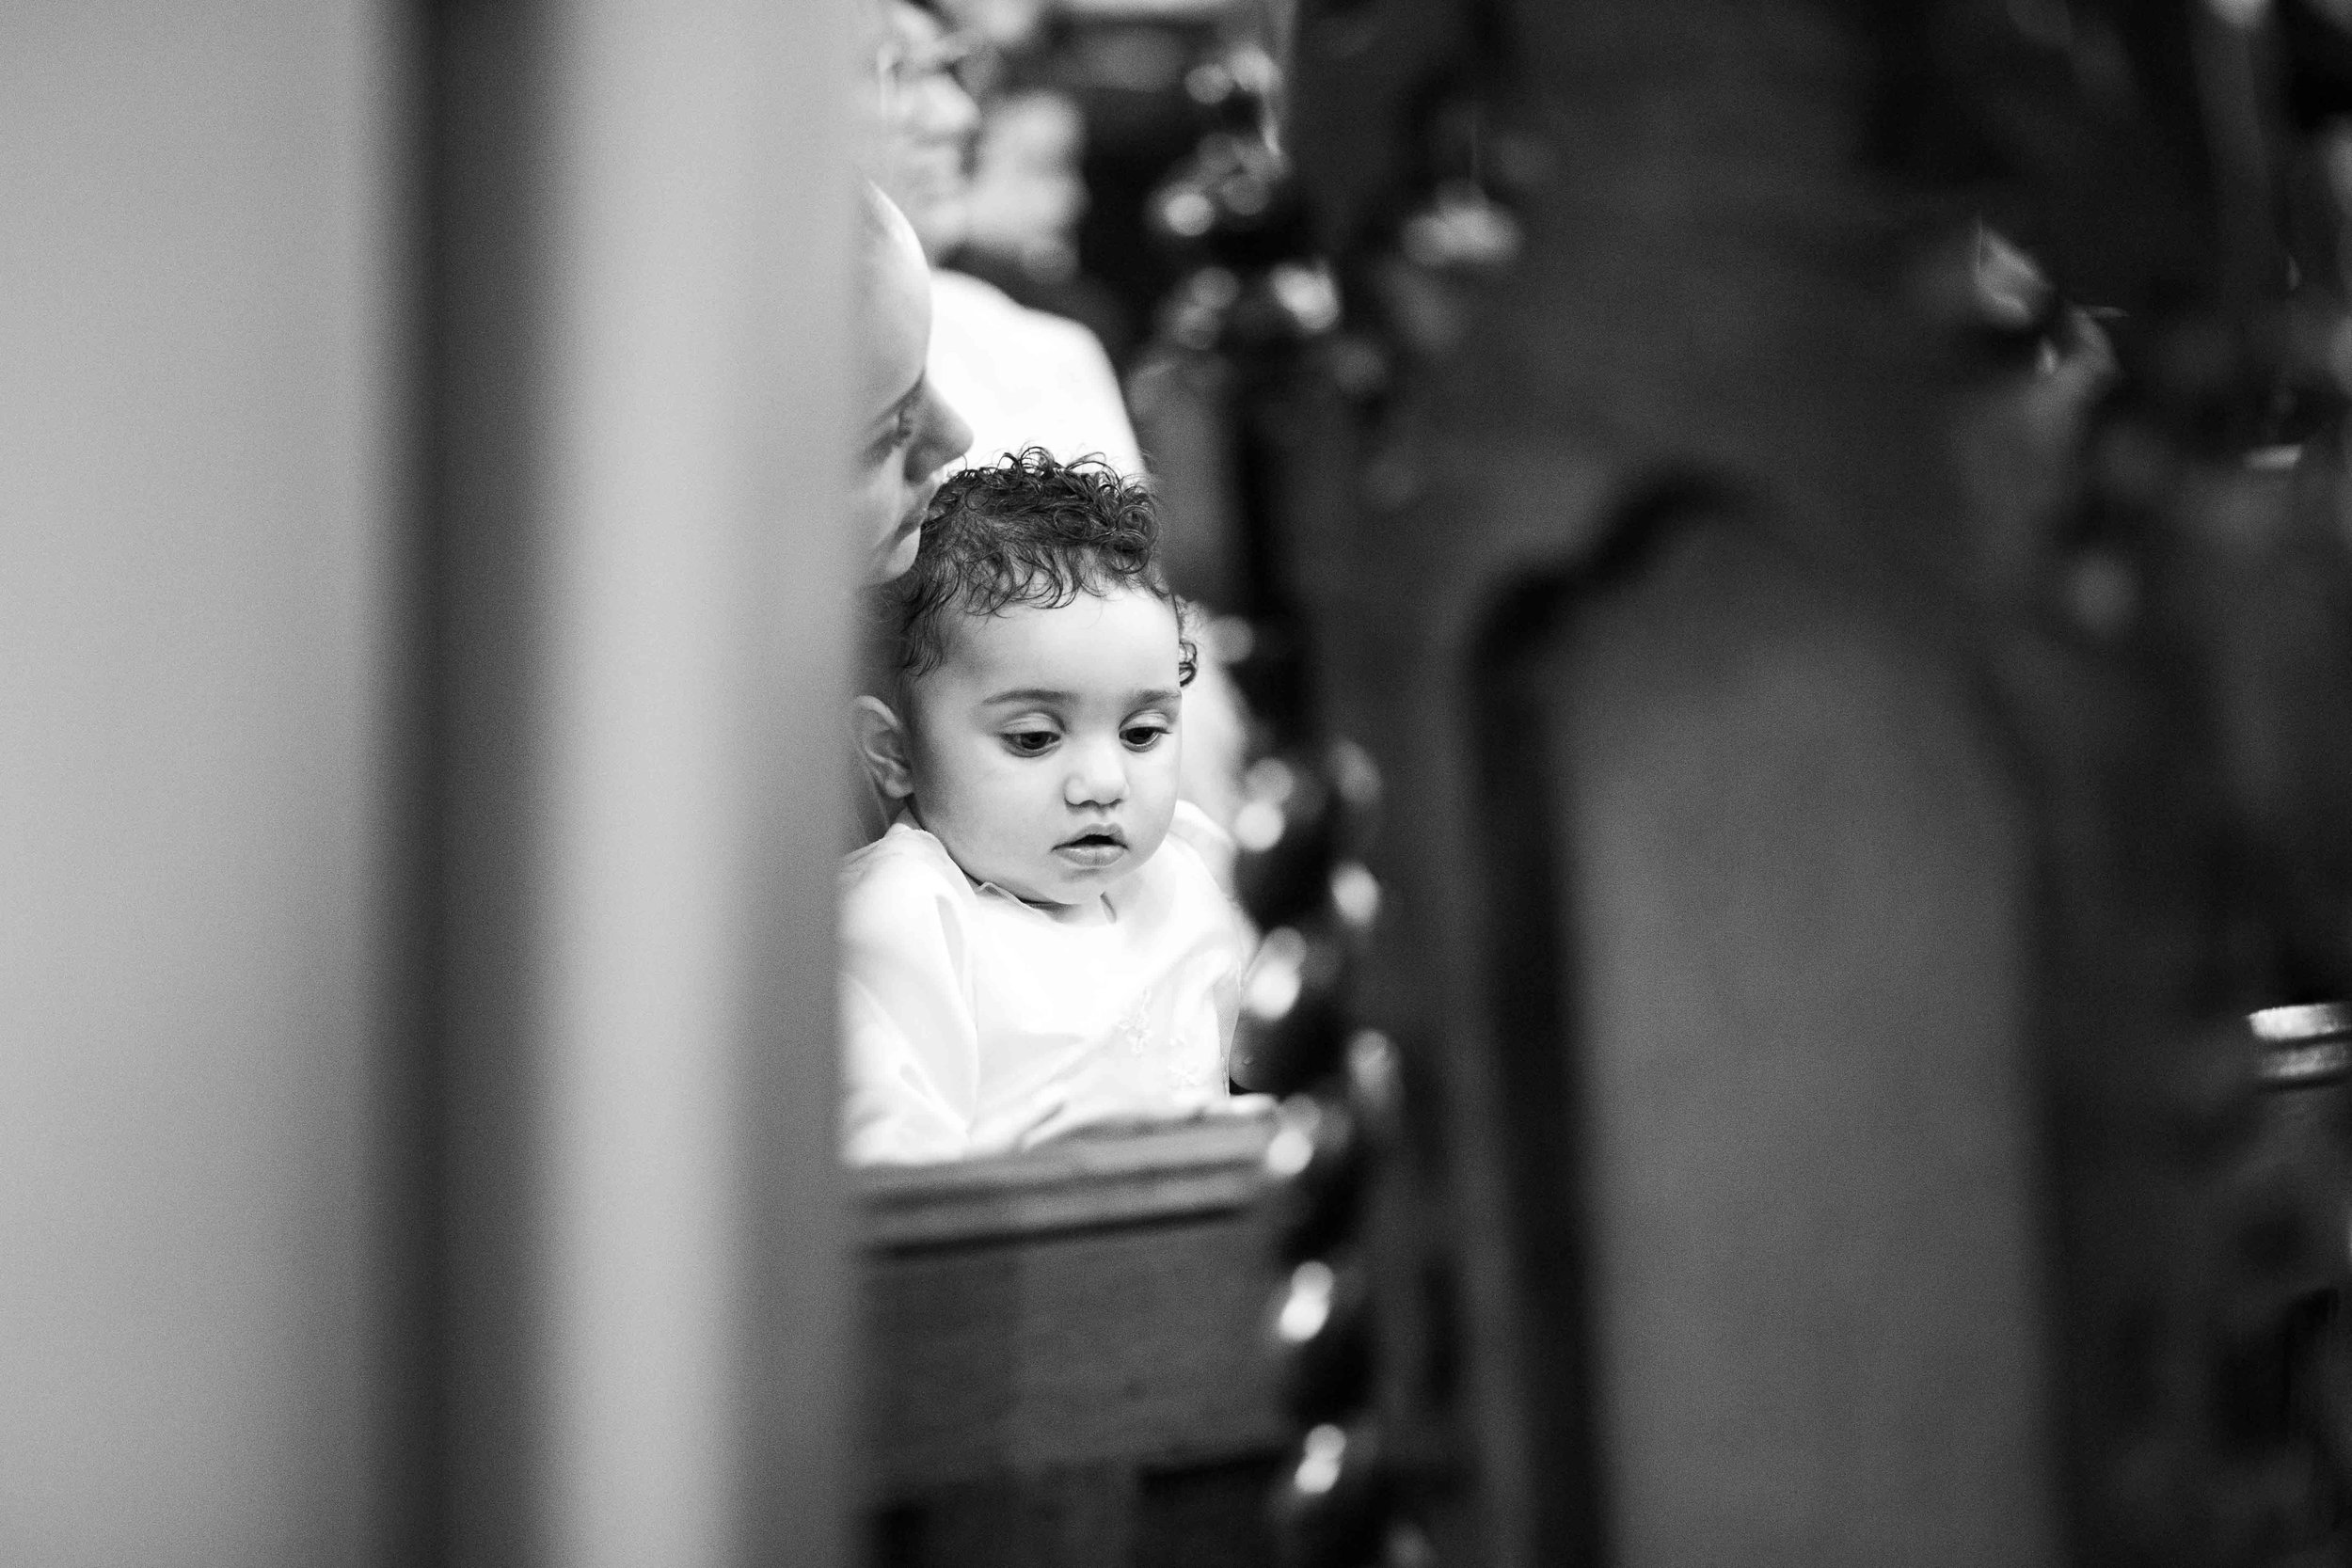 Lea-cooper-photography-christening-photographer-baptism-wolverhampton-wednesbury-walsall-willenhall-dudley-church-chapel-event-photography-14.jpg